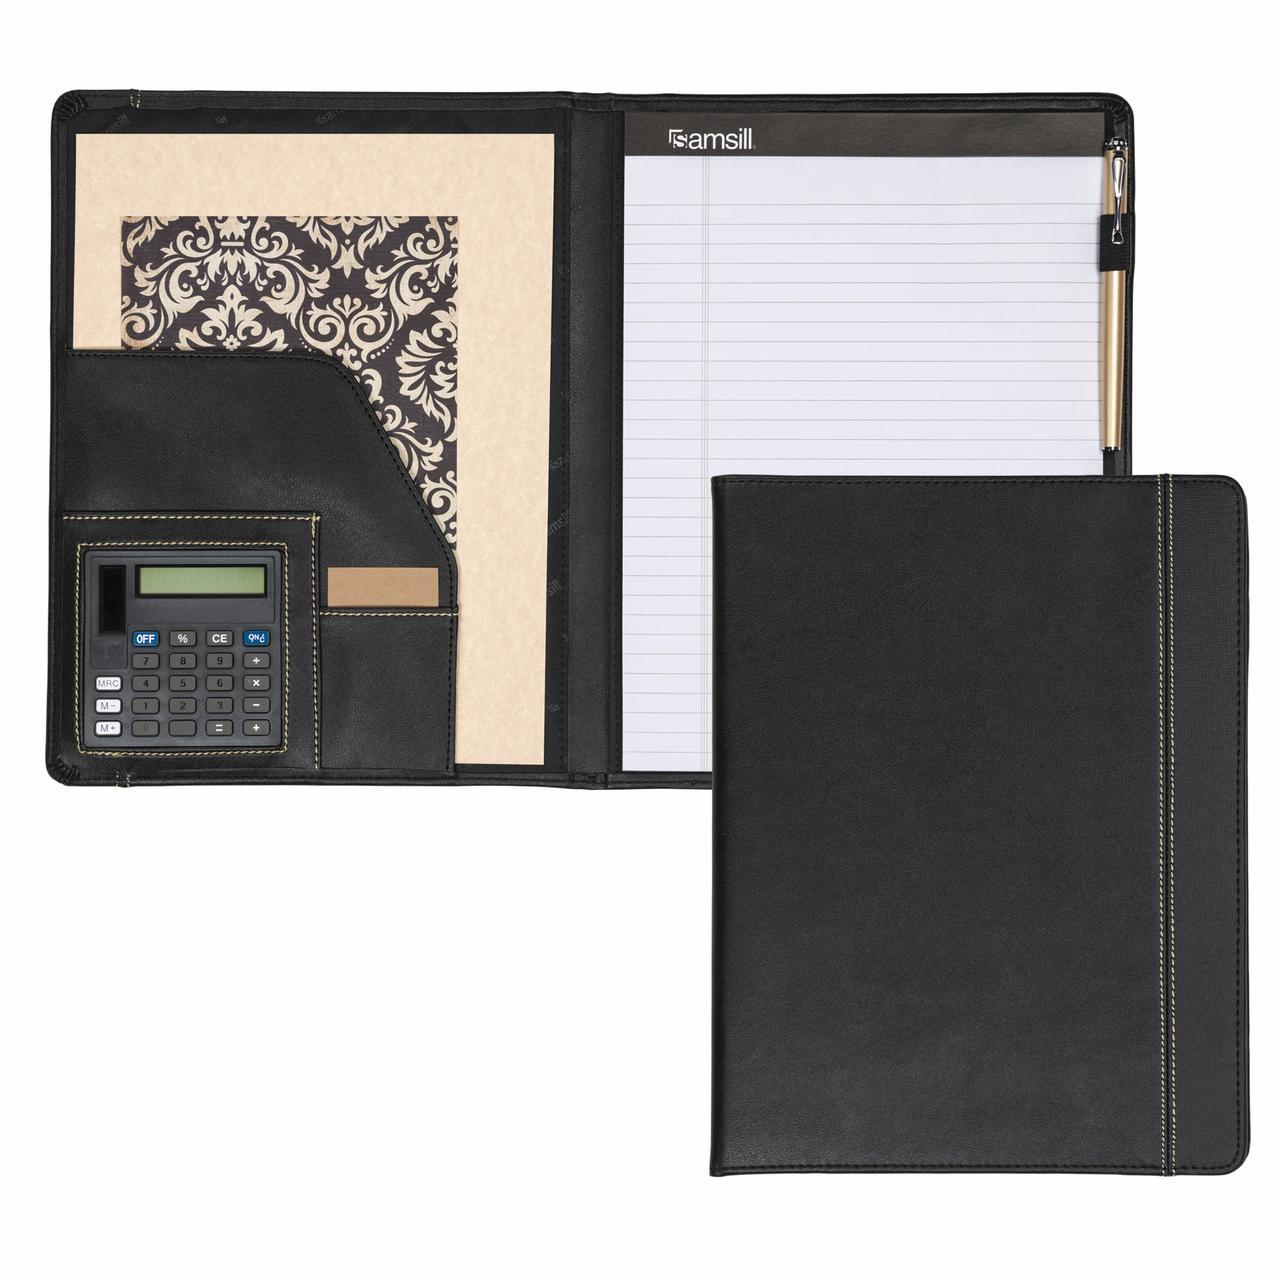 "Samsill Professional Slimline Padfolio with Calculator, 8.5""x11"" Writing Pad Included, Black"